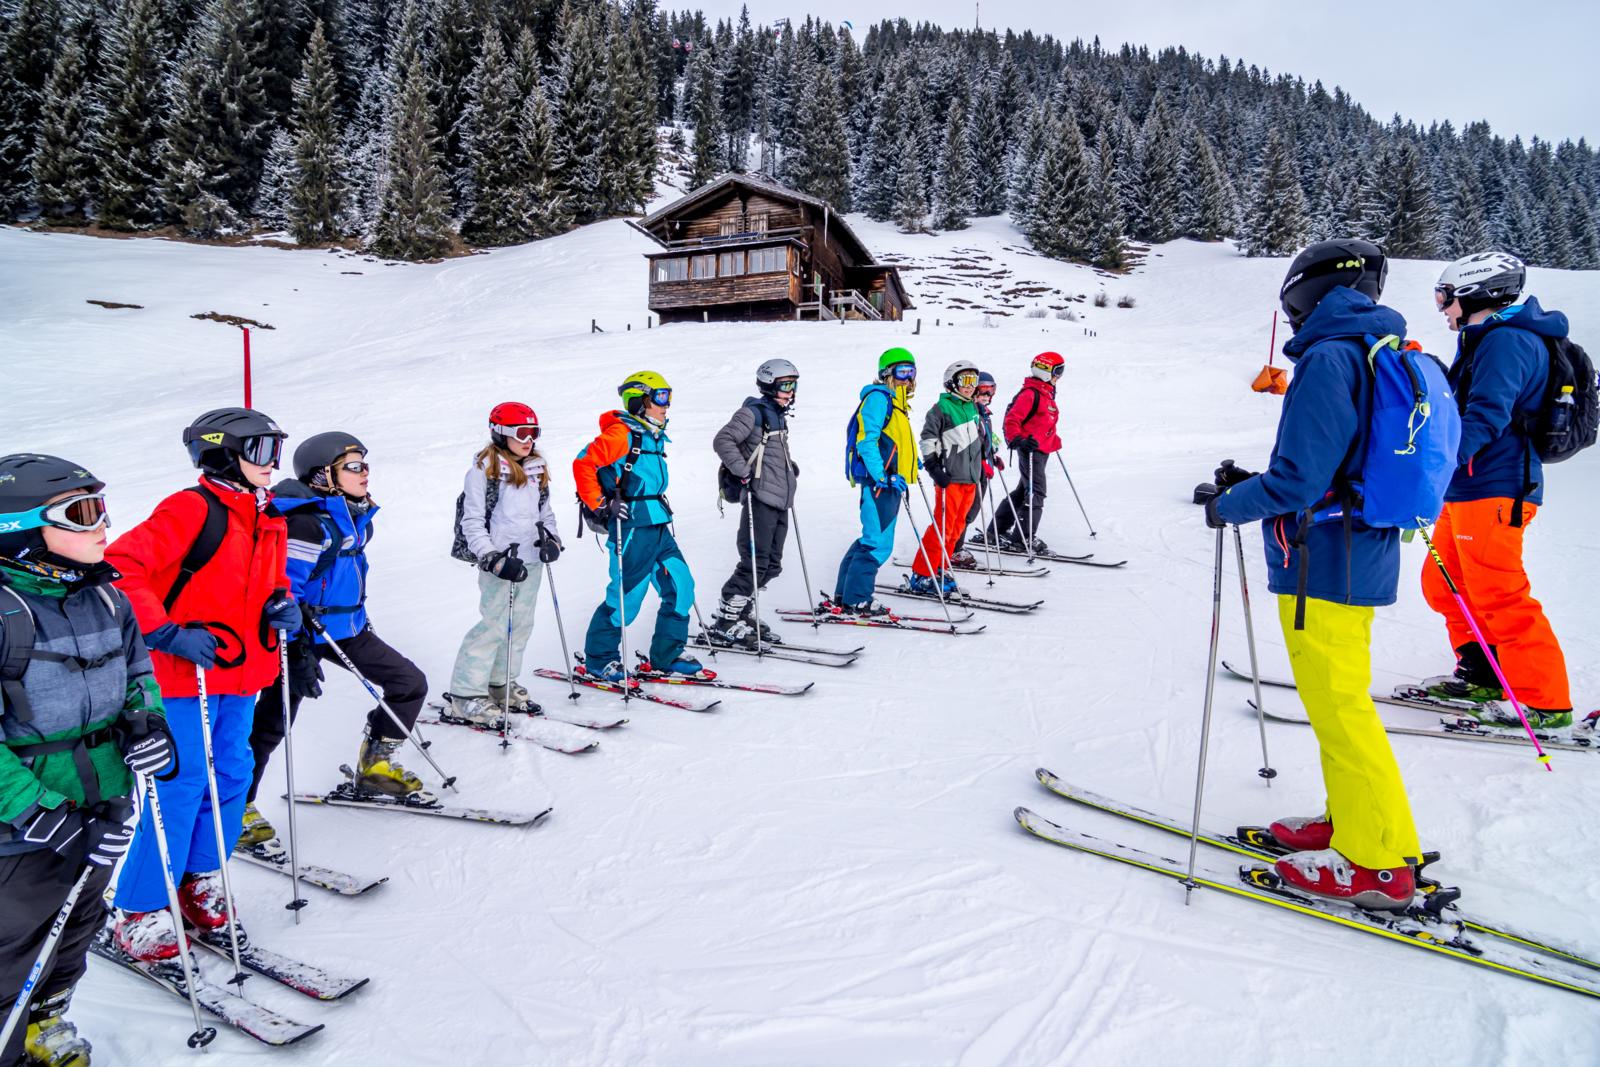 [2022] Skiën tot in de achtertuin GROEP 2 - Krokus - Tulfes